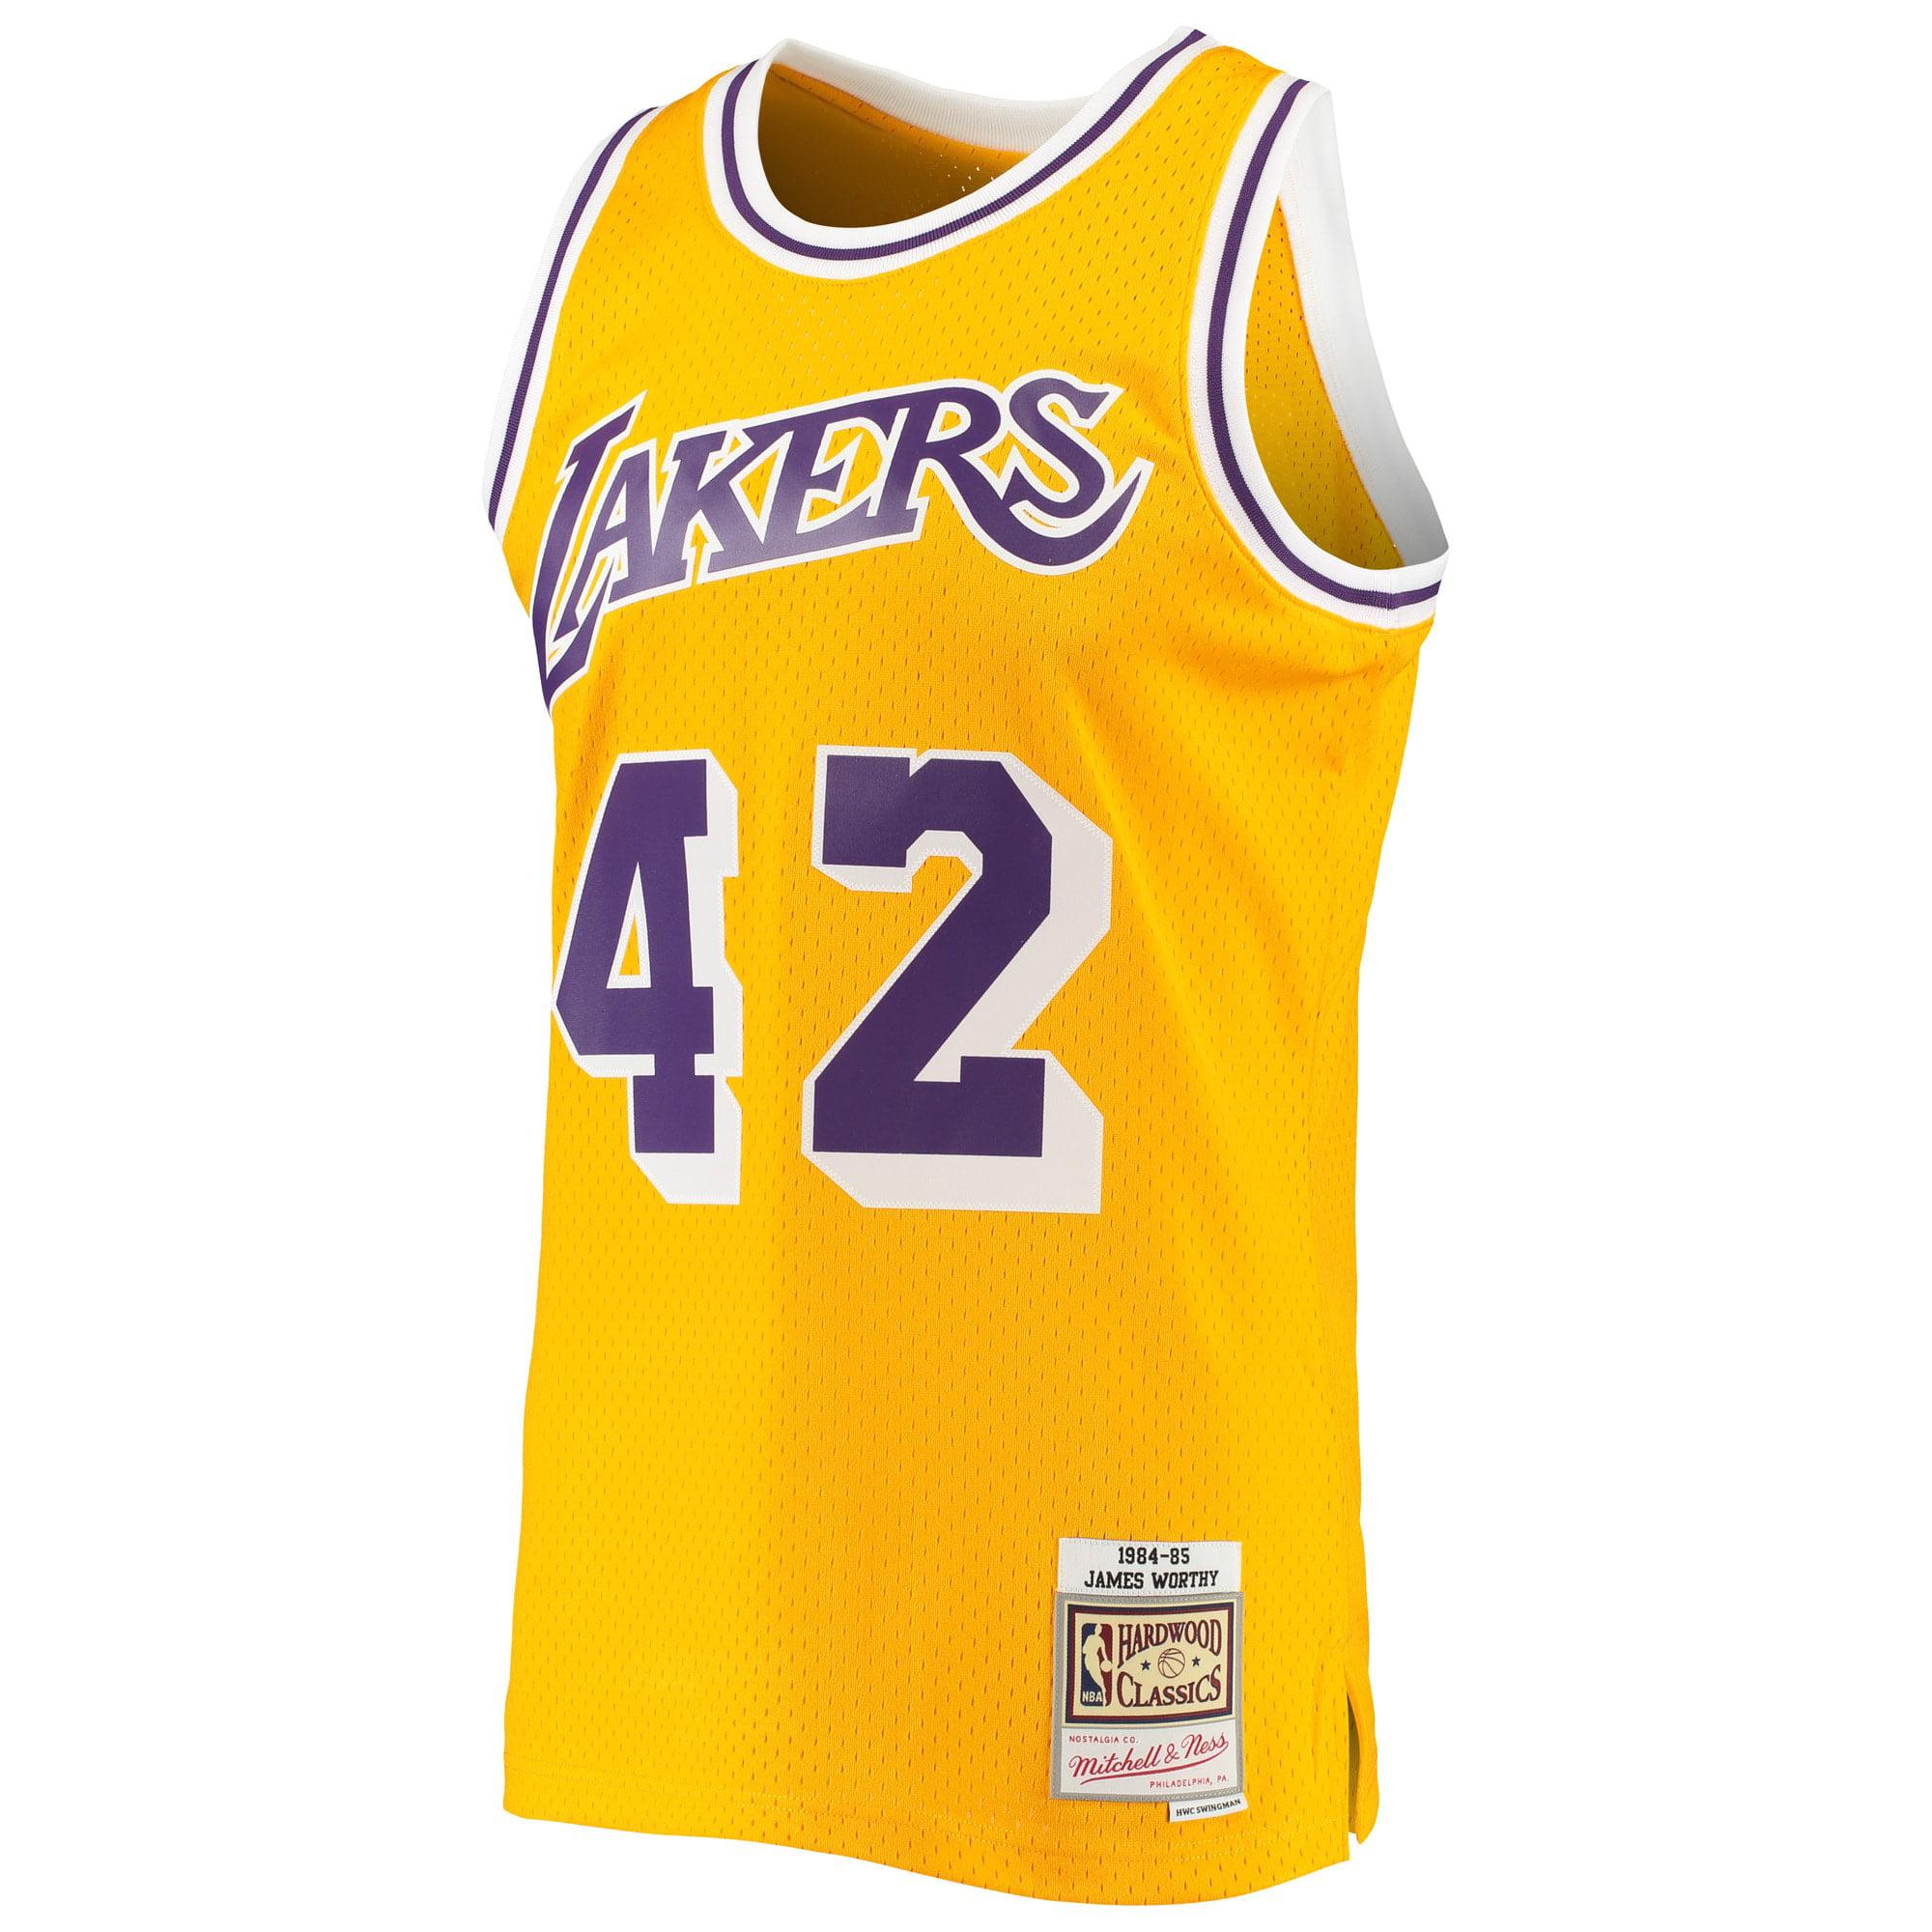 James Worthy Los Angeles Lakers Mitchell & Ness 1984-85 Hardwood Classics Swingman Jersey - Gold